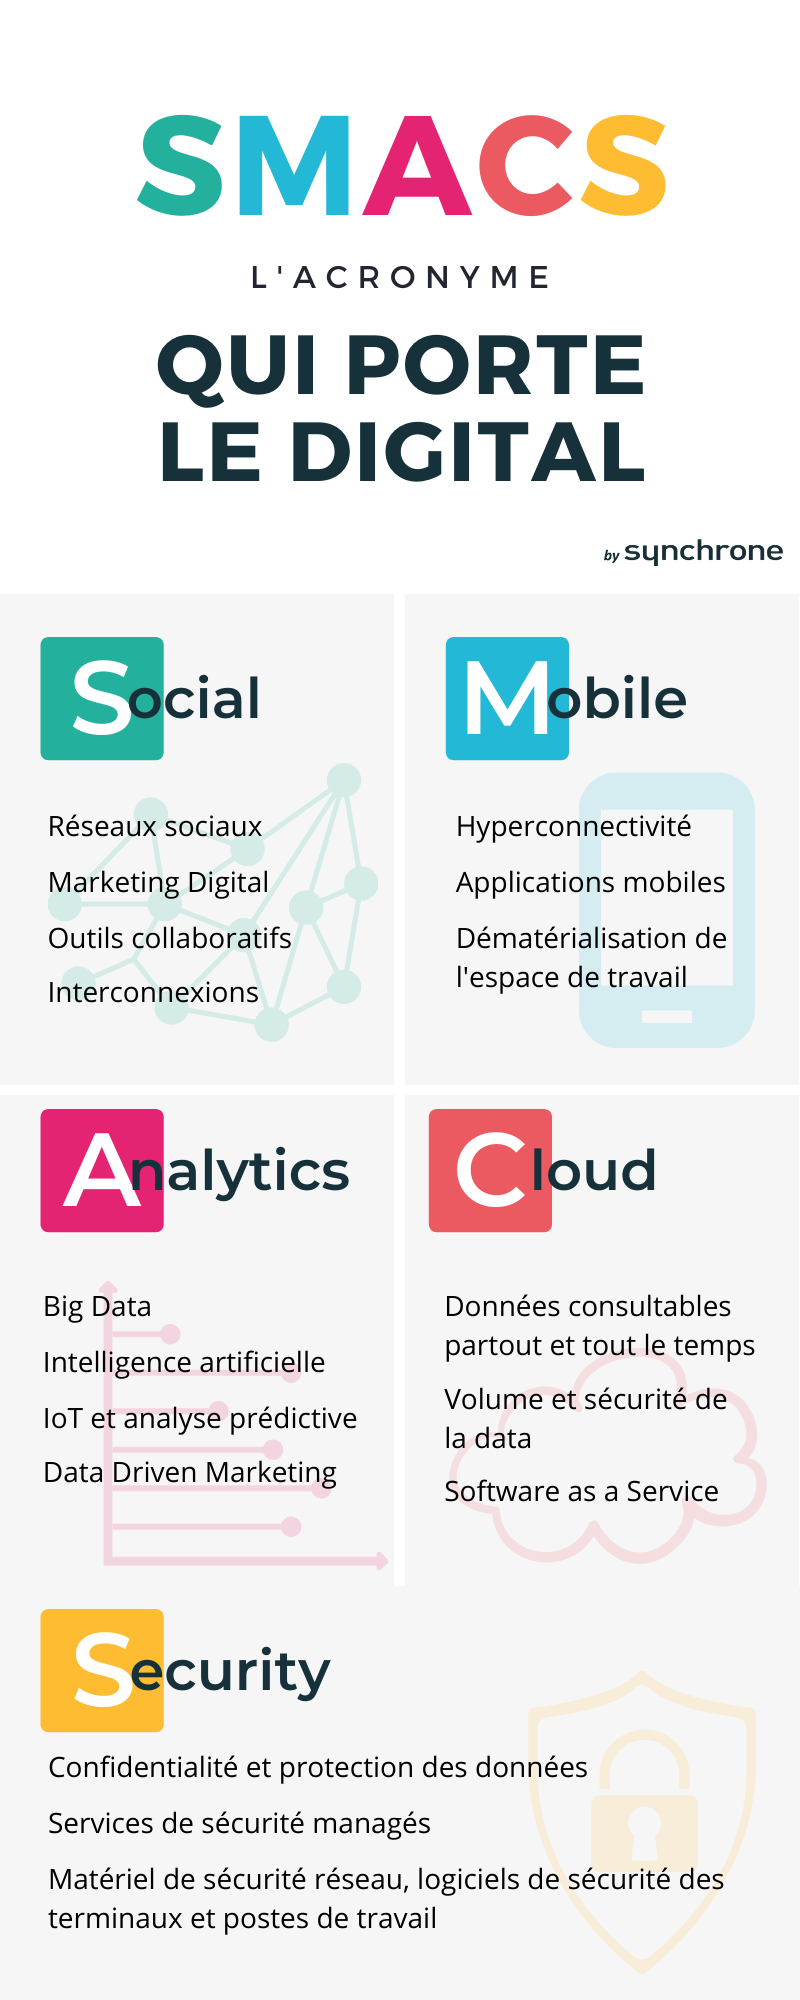 SMACS : acronyme